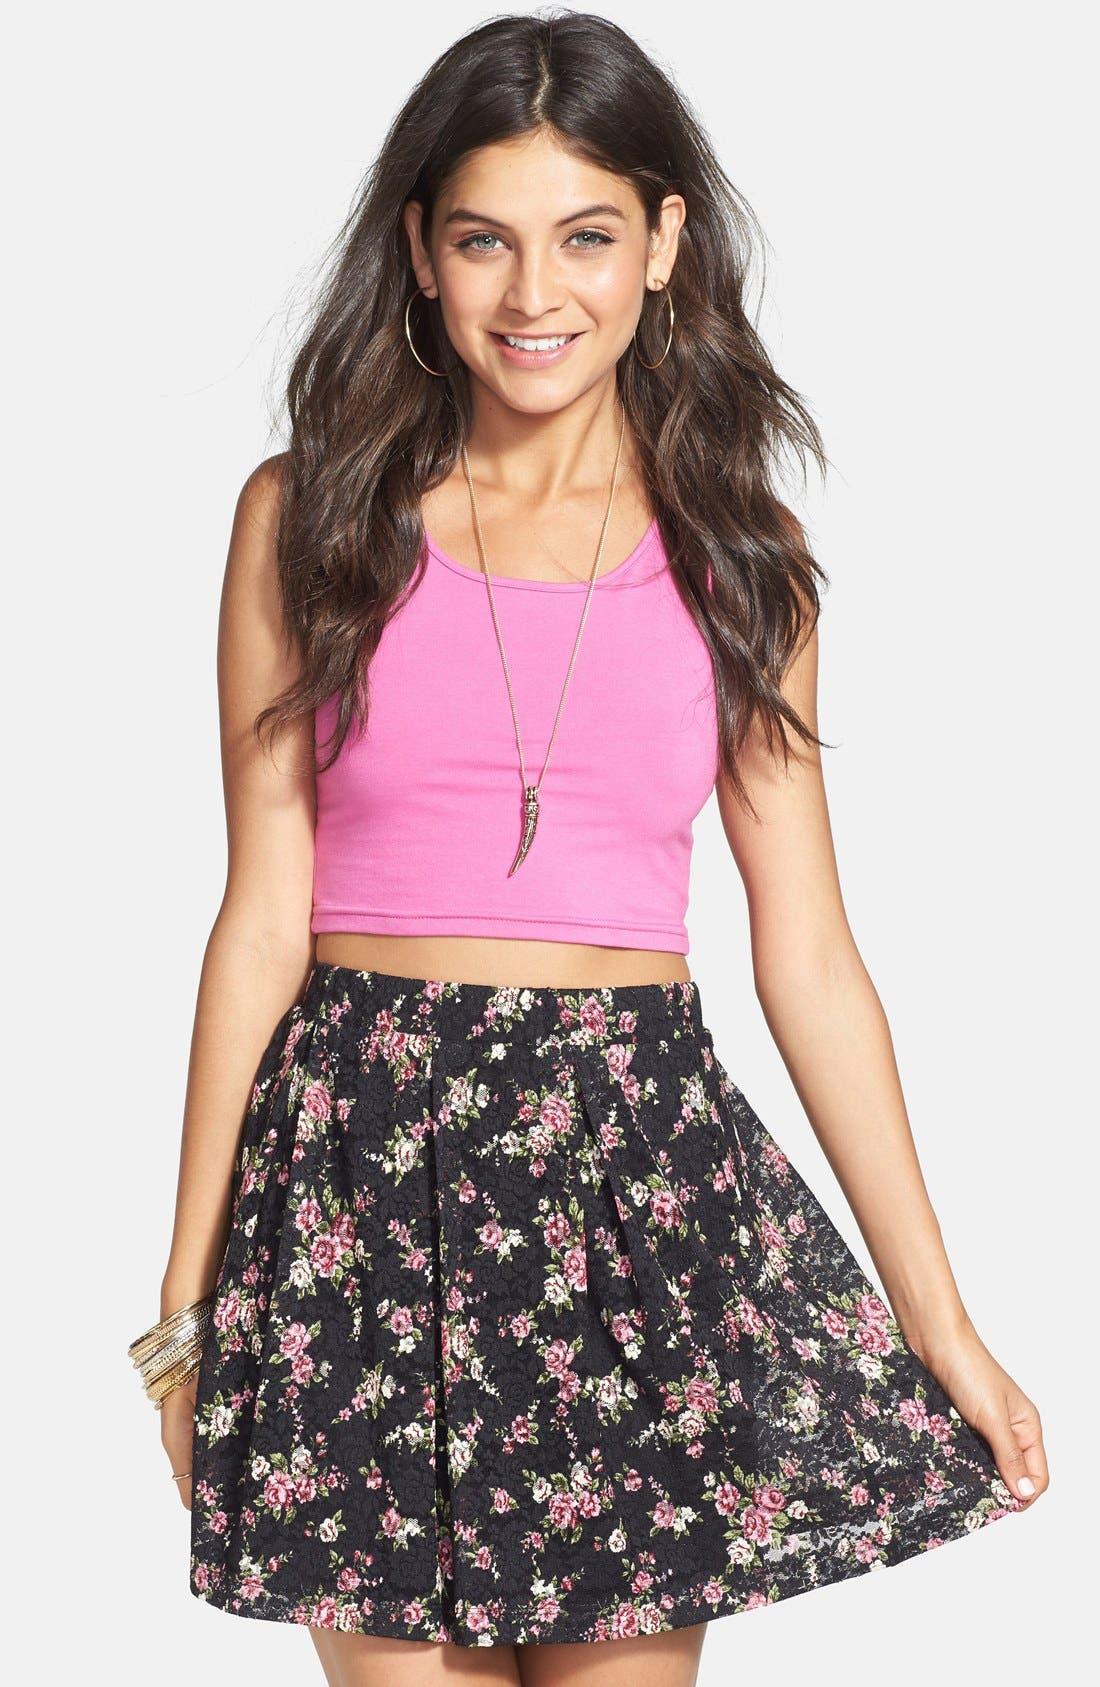 Floral Lace Skirt,                             Main thumbnail 1, color,                             001